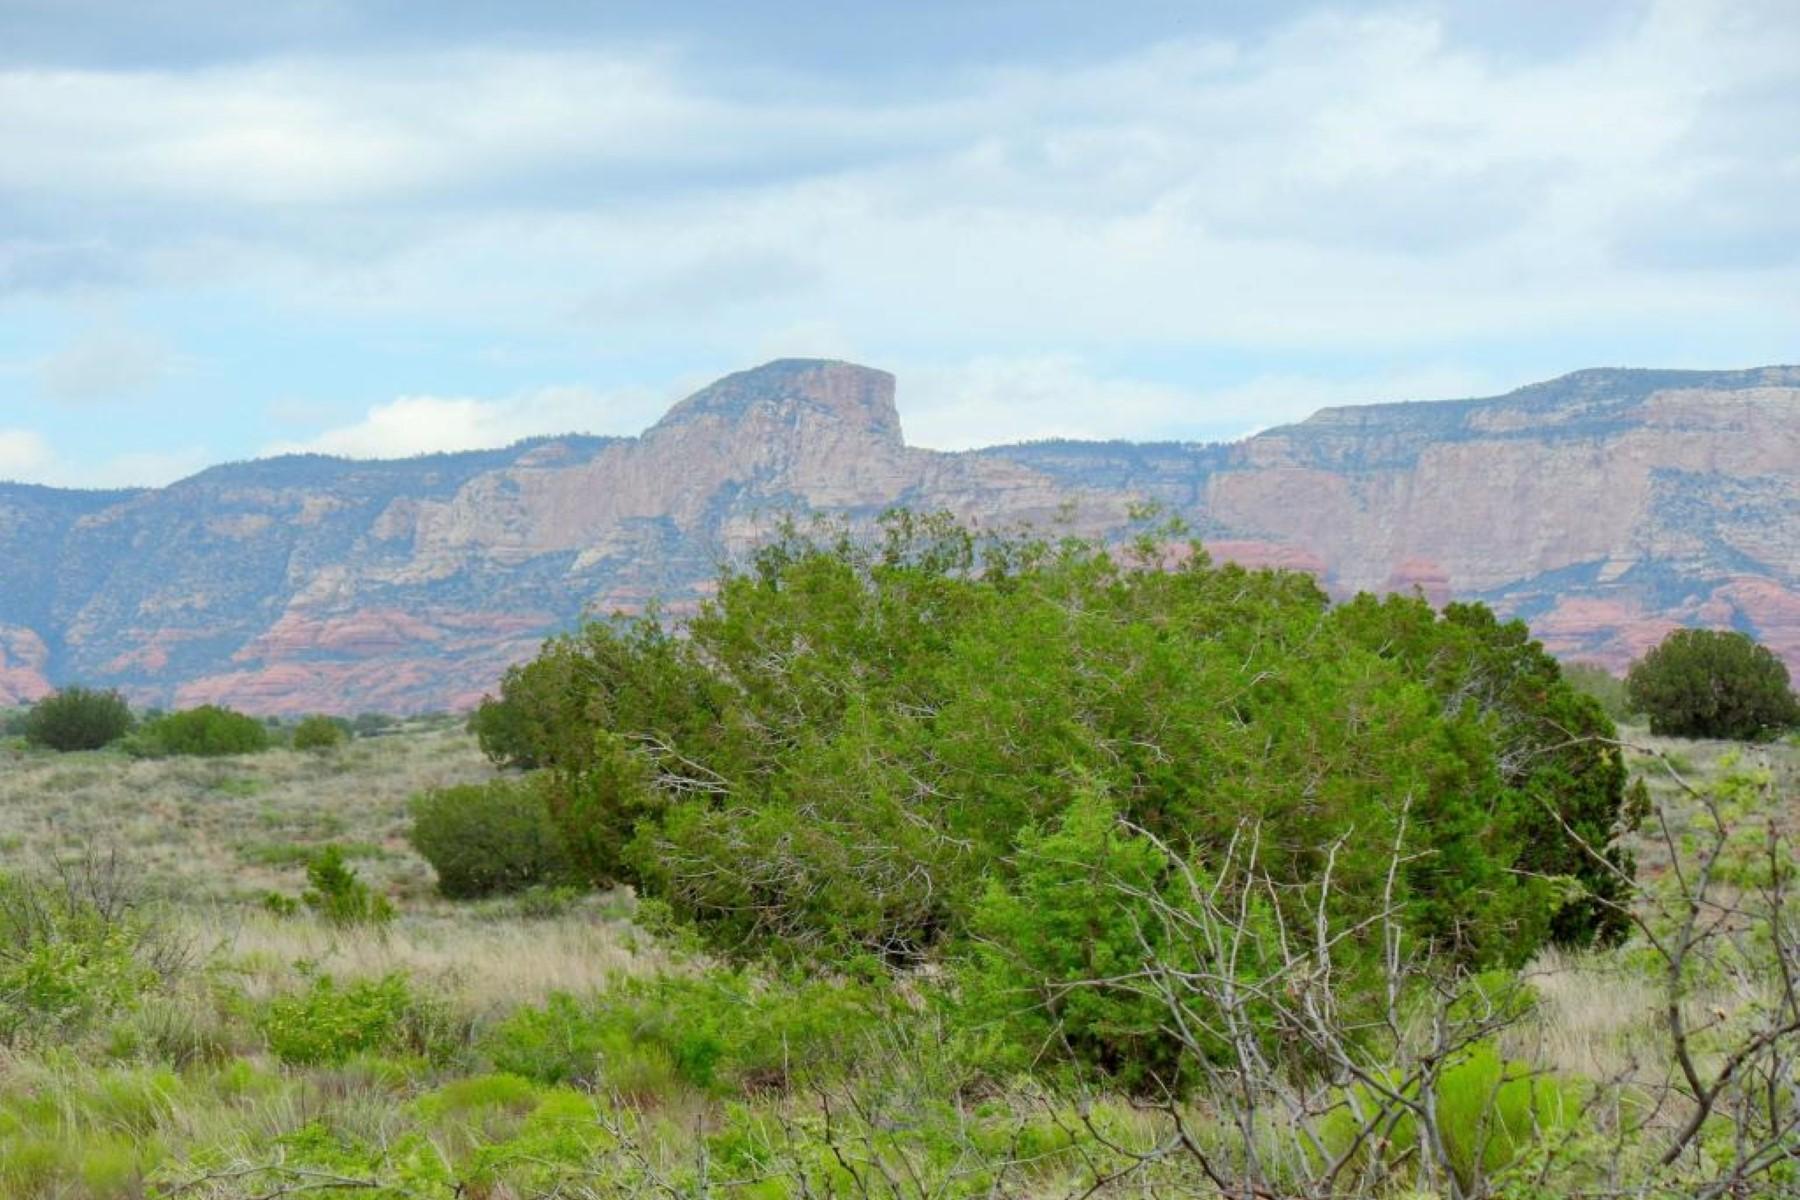 Terreno por un Venta en Wonderful 5.02 acre lot with mountain views. 6300 Bill Gray Rd Sedona, Arizona 86336 Estados Unidos